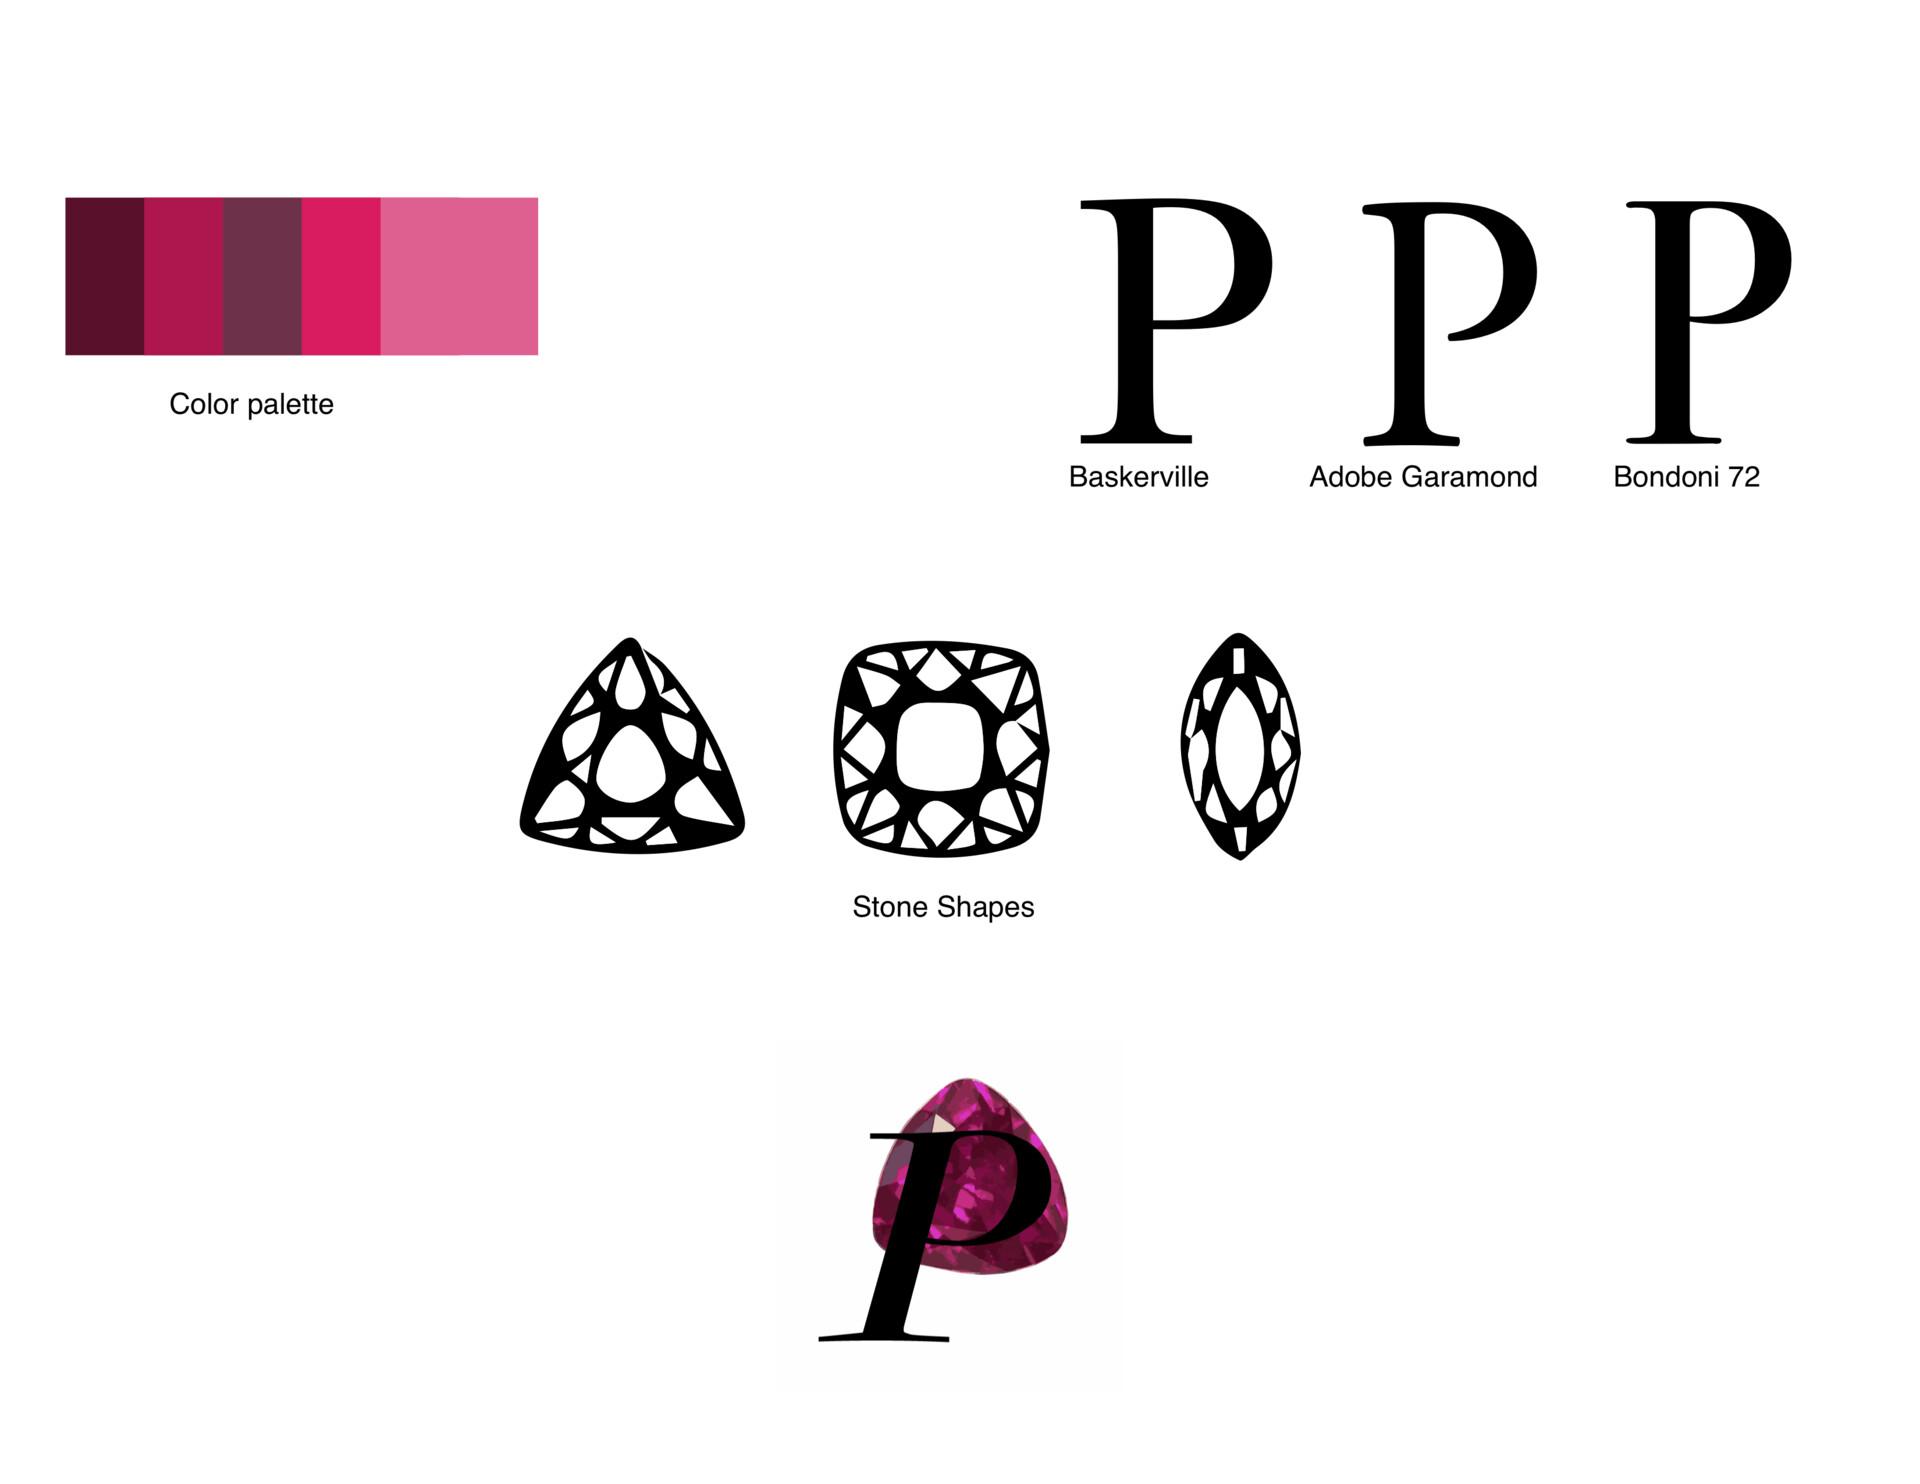 Randall mcnair pplogodesign set